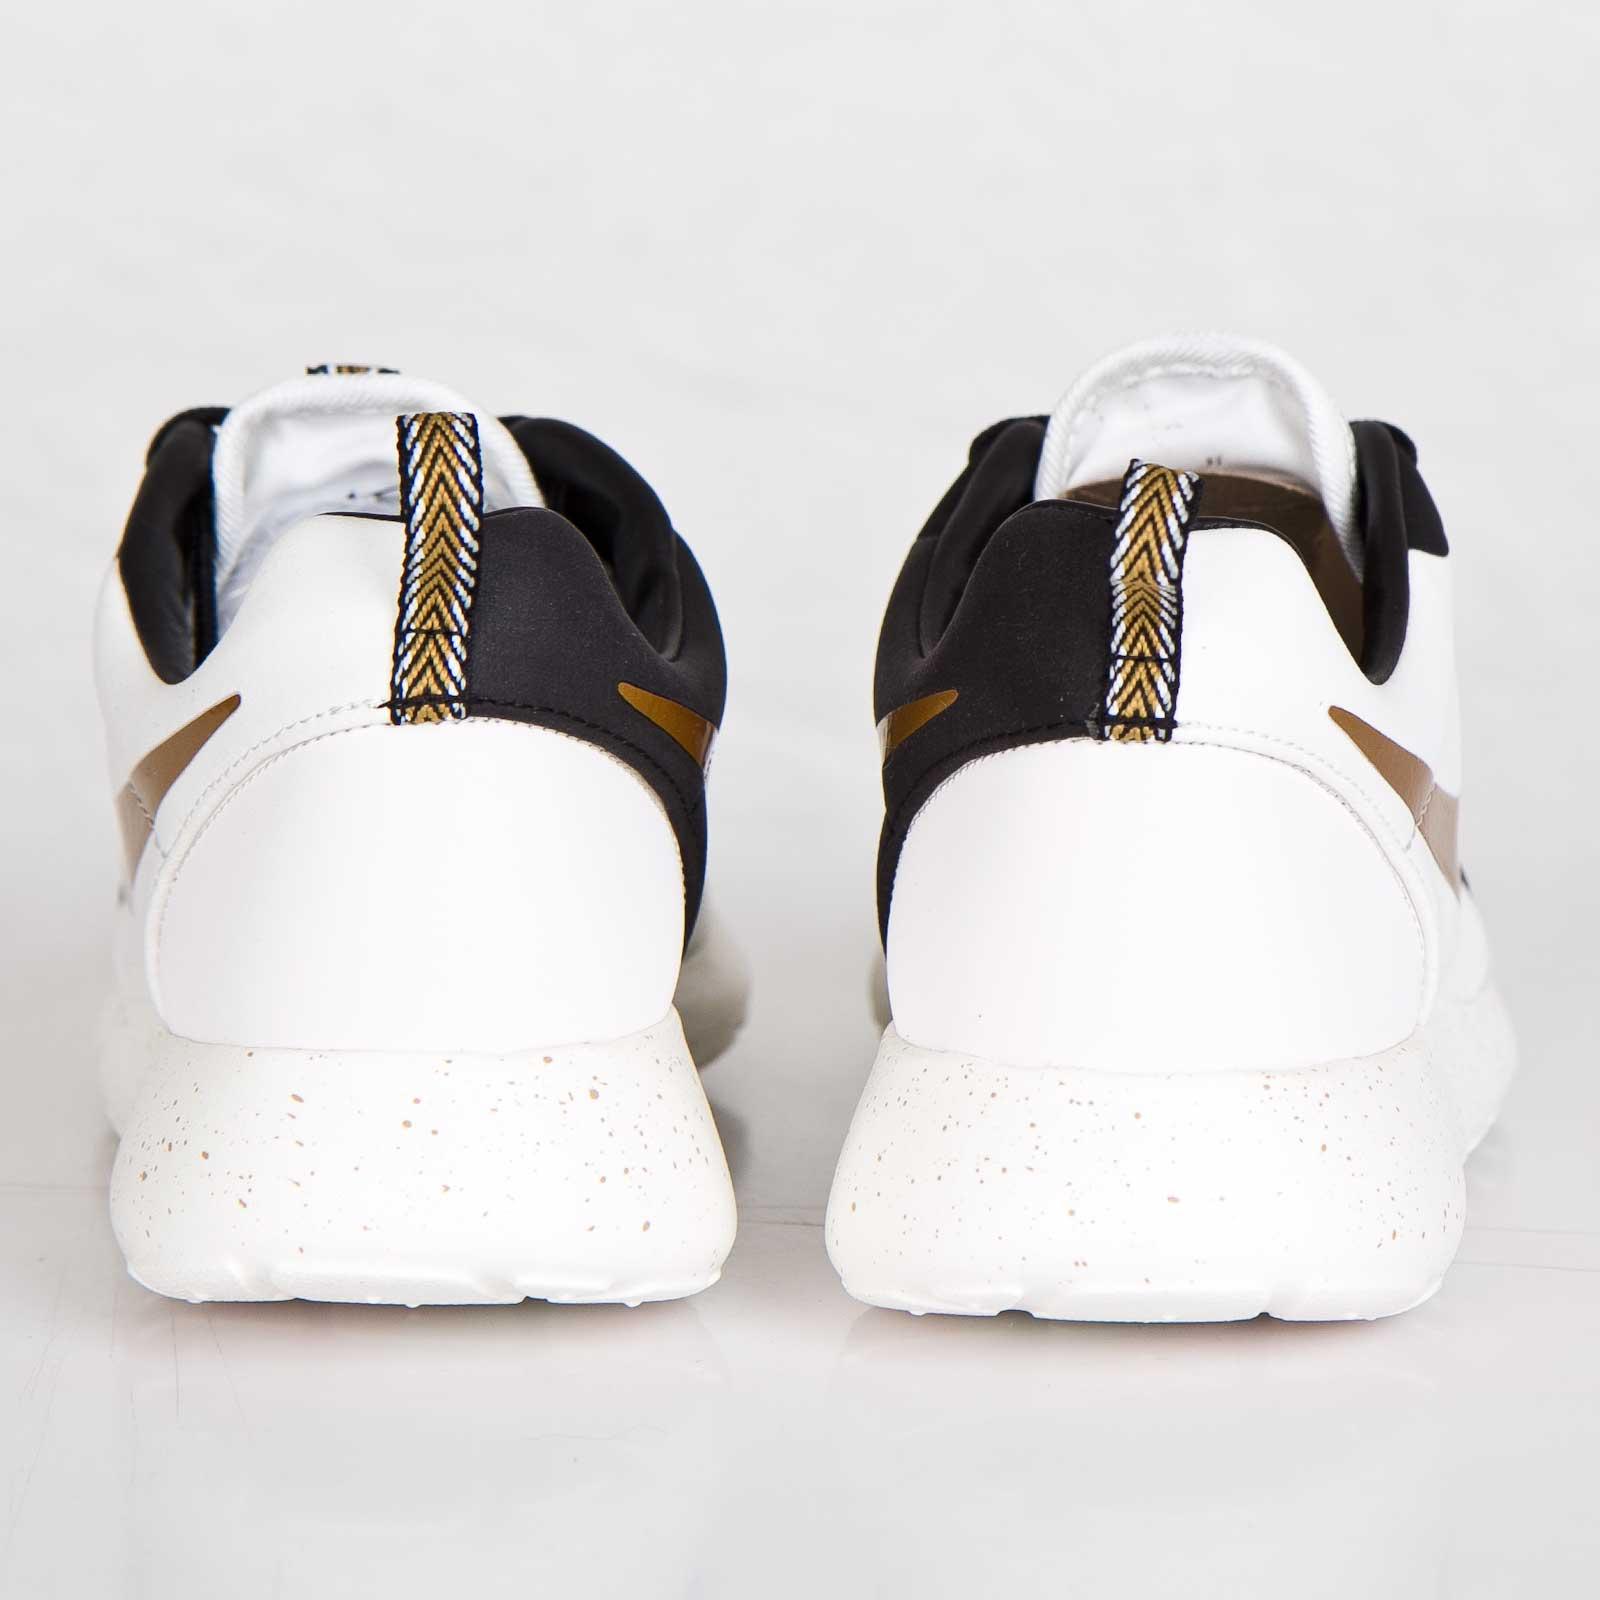 outlet store bc4ba 0cd41 Nike Roshe Run Hyperfuse Premium QS - 669689-100 - Sneakersnstuff    sneakers   streetwear online since 1999